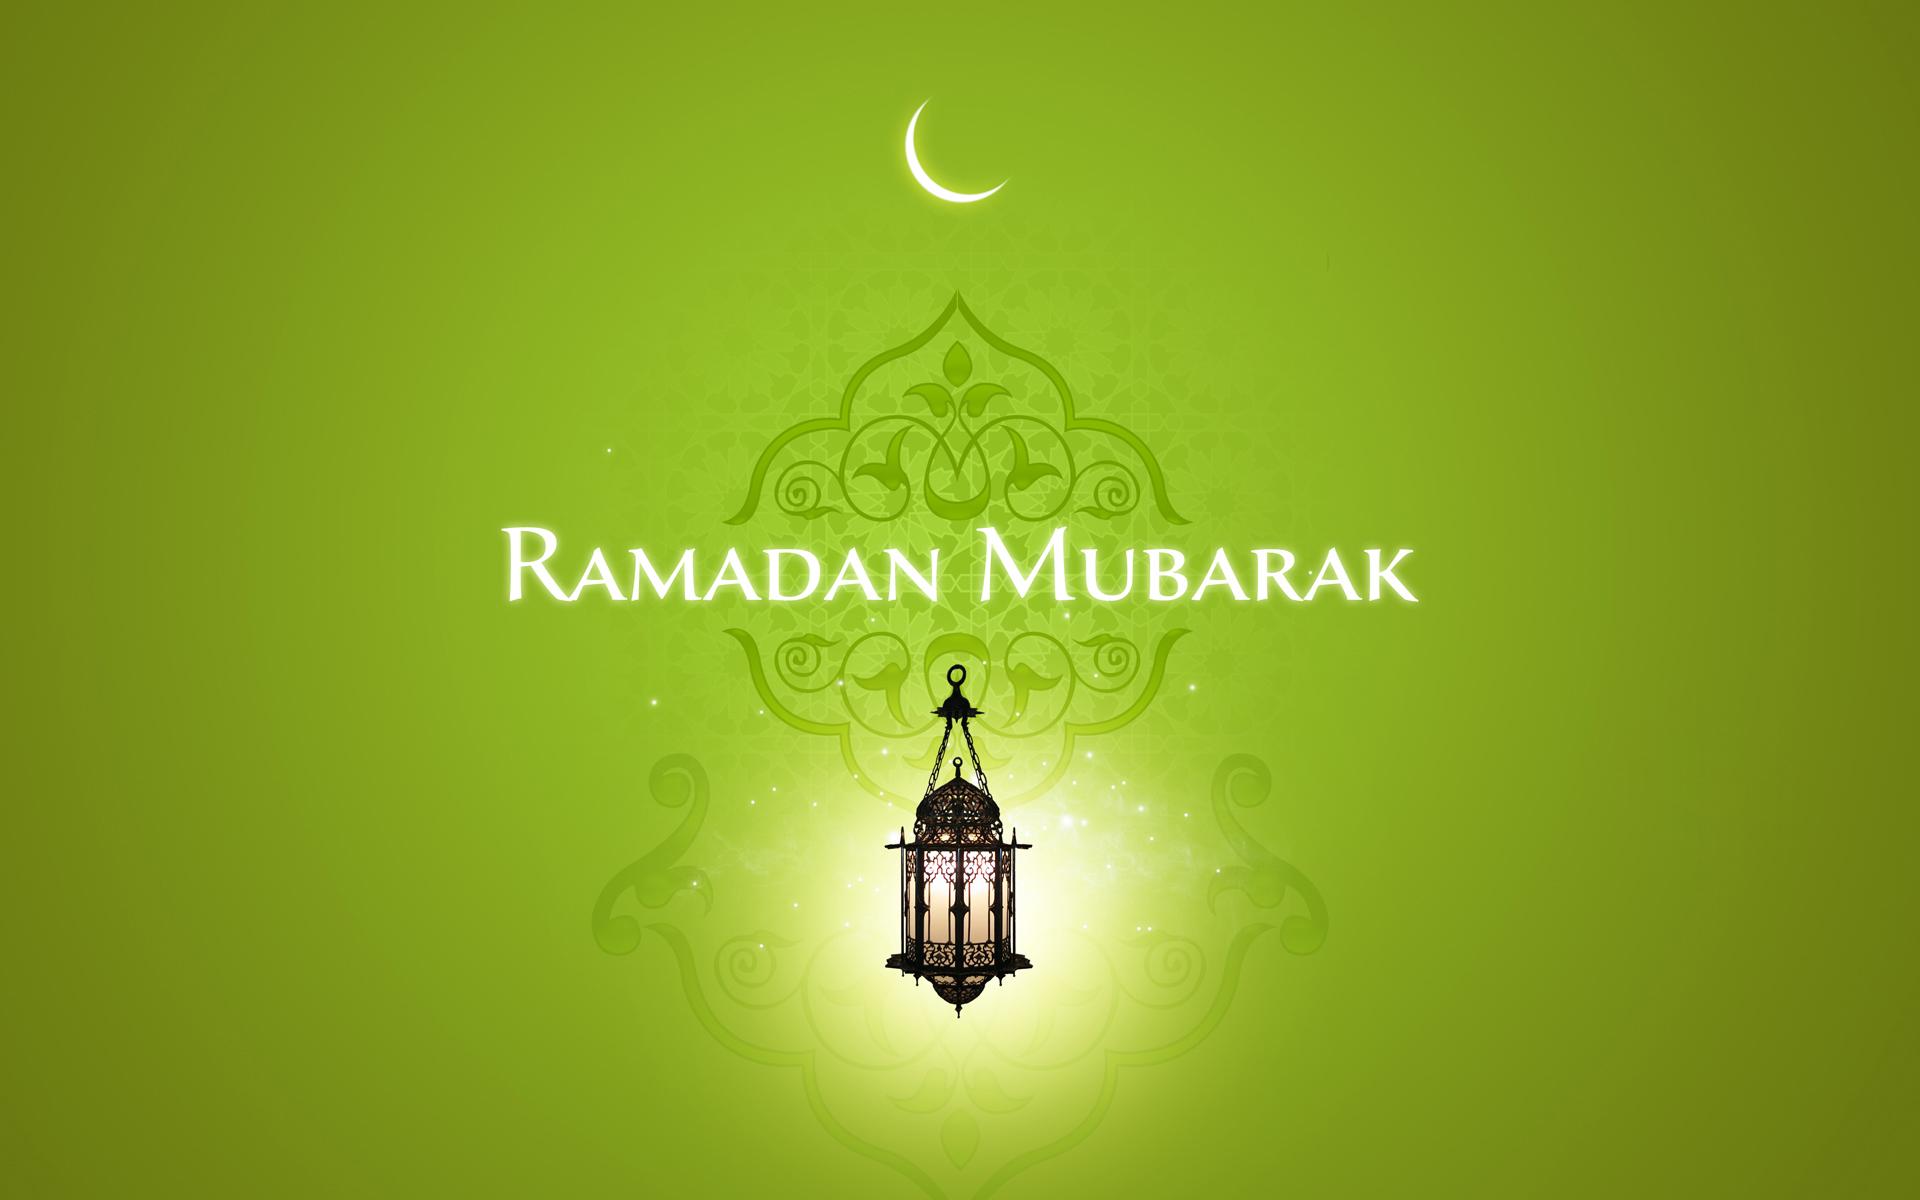 Top Ramadan Wallpaper Free Download Islam Hd Desktop